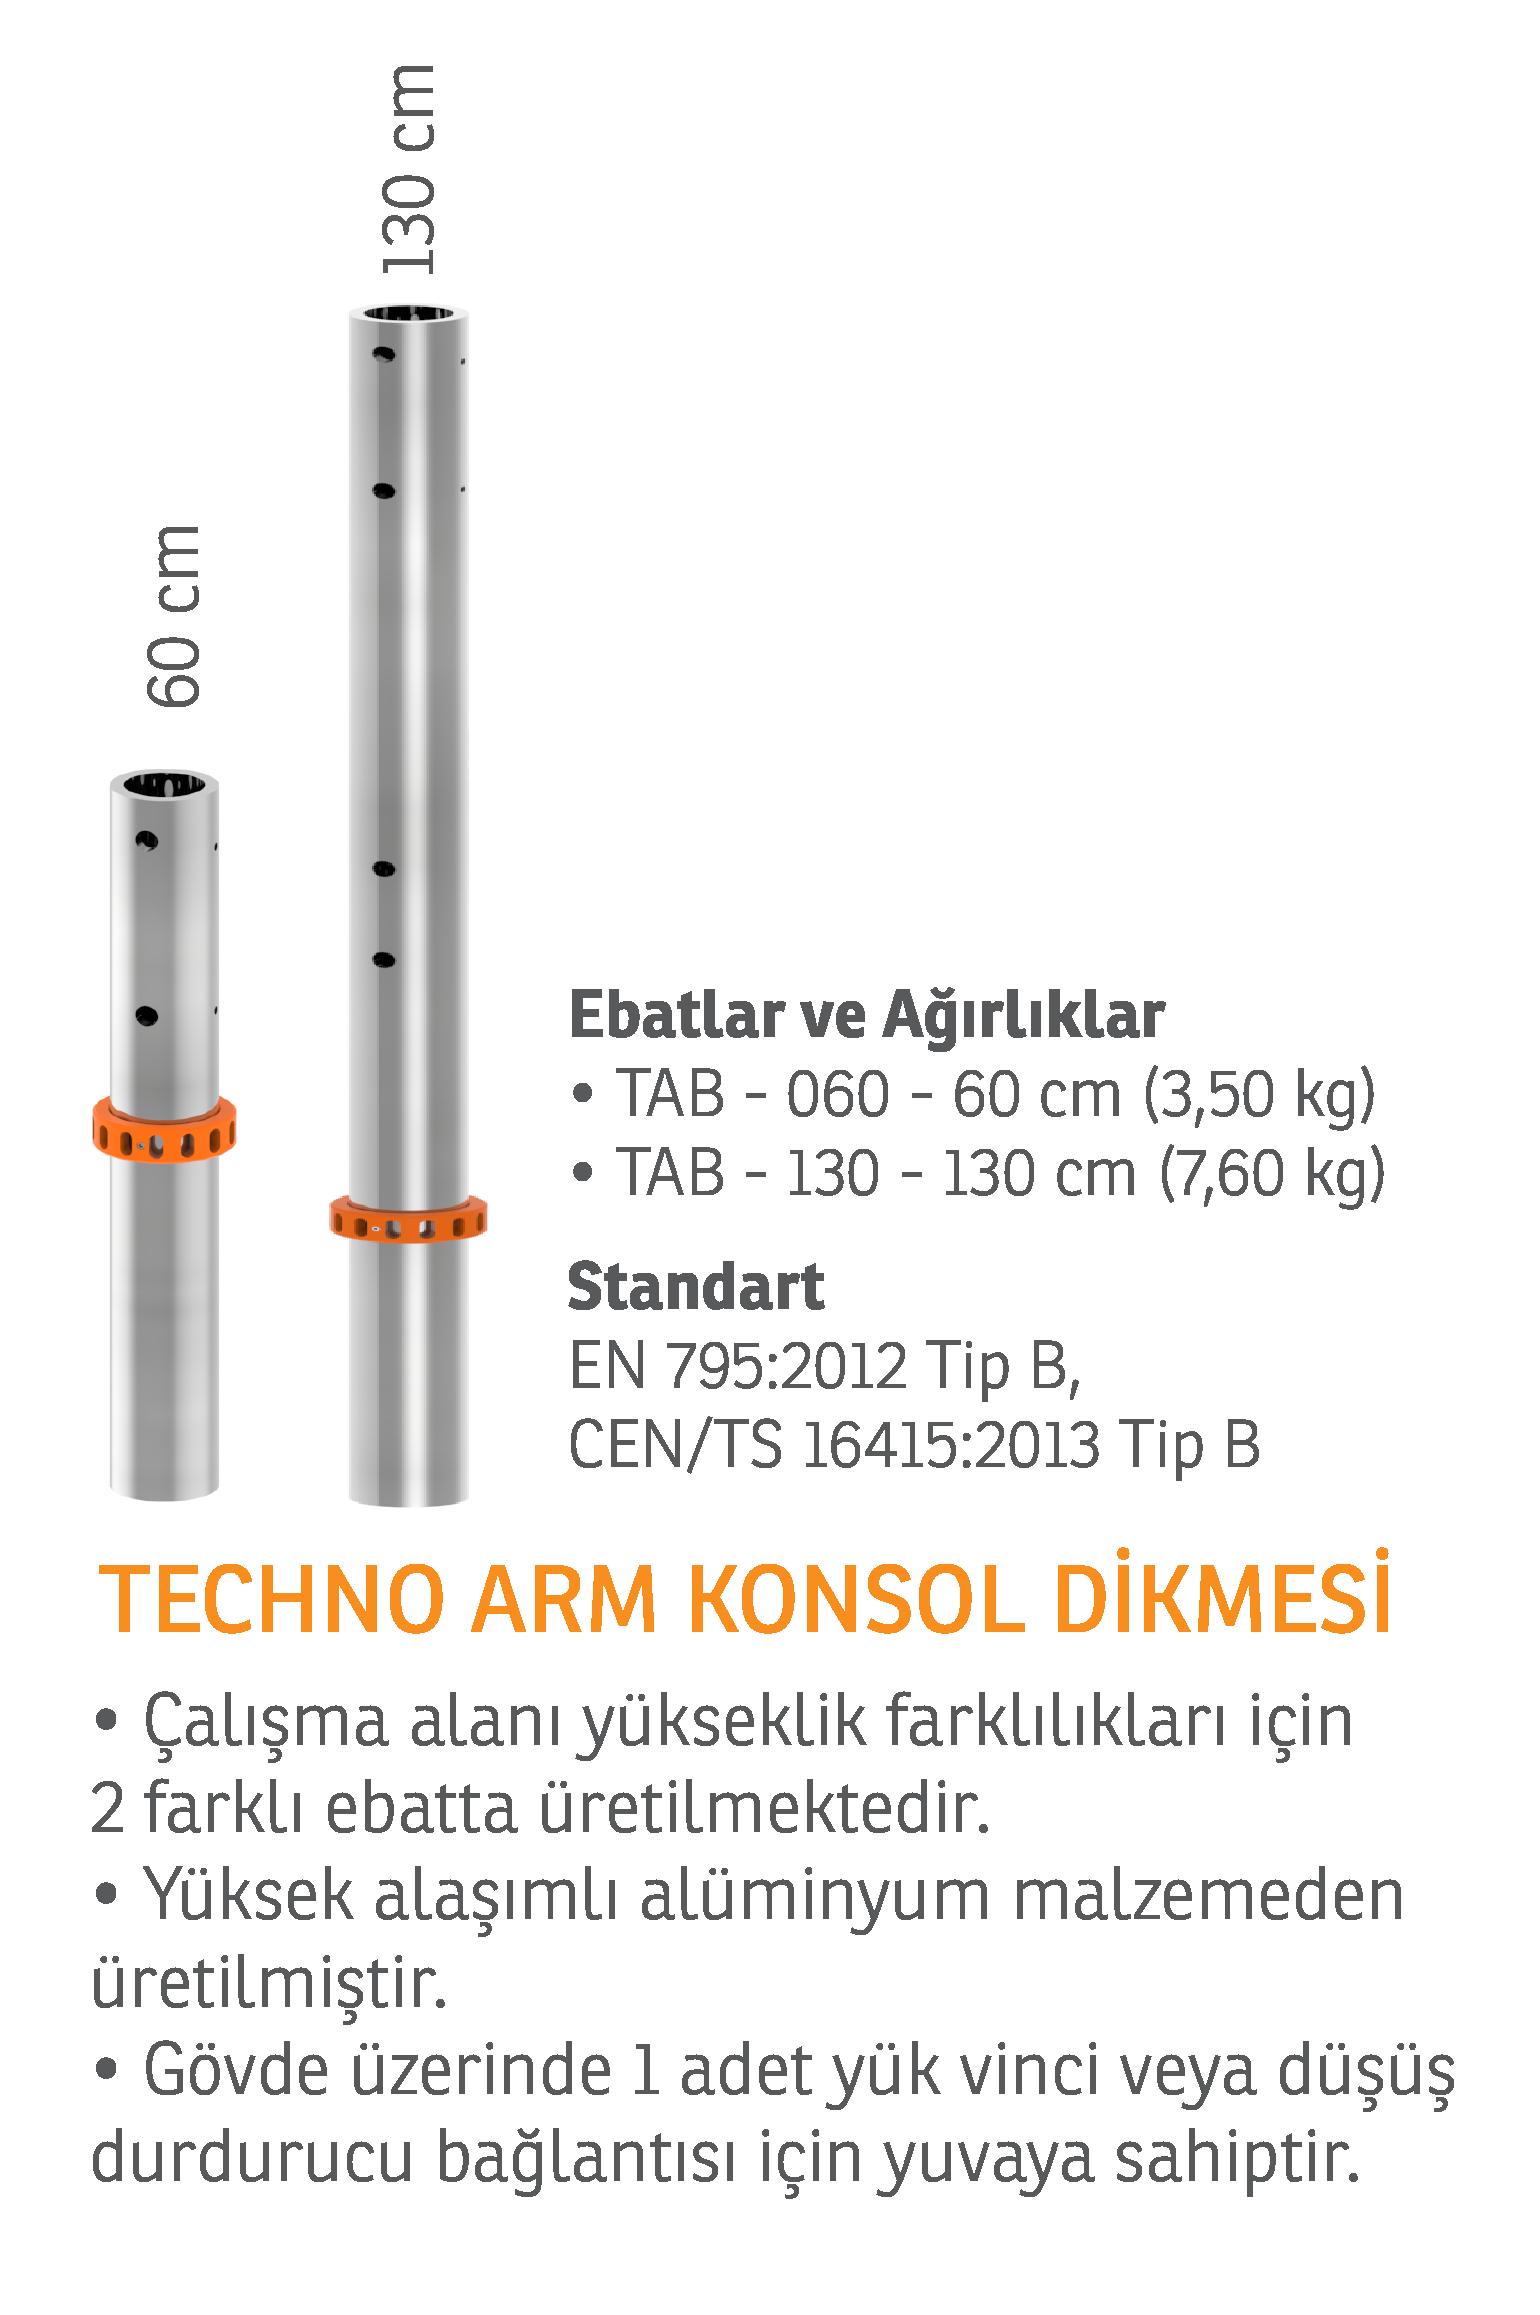 TECHNO ARM